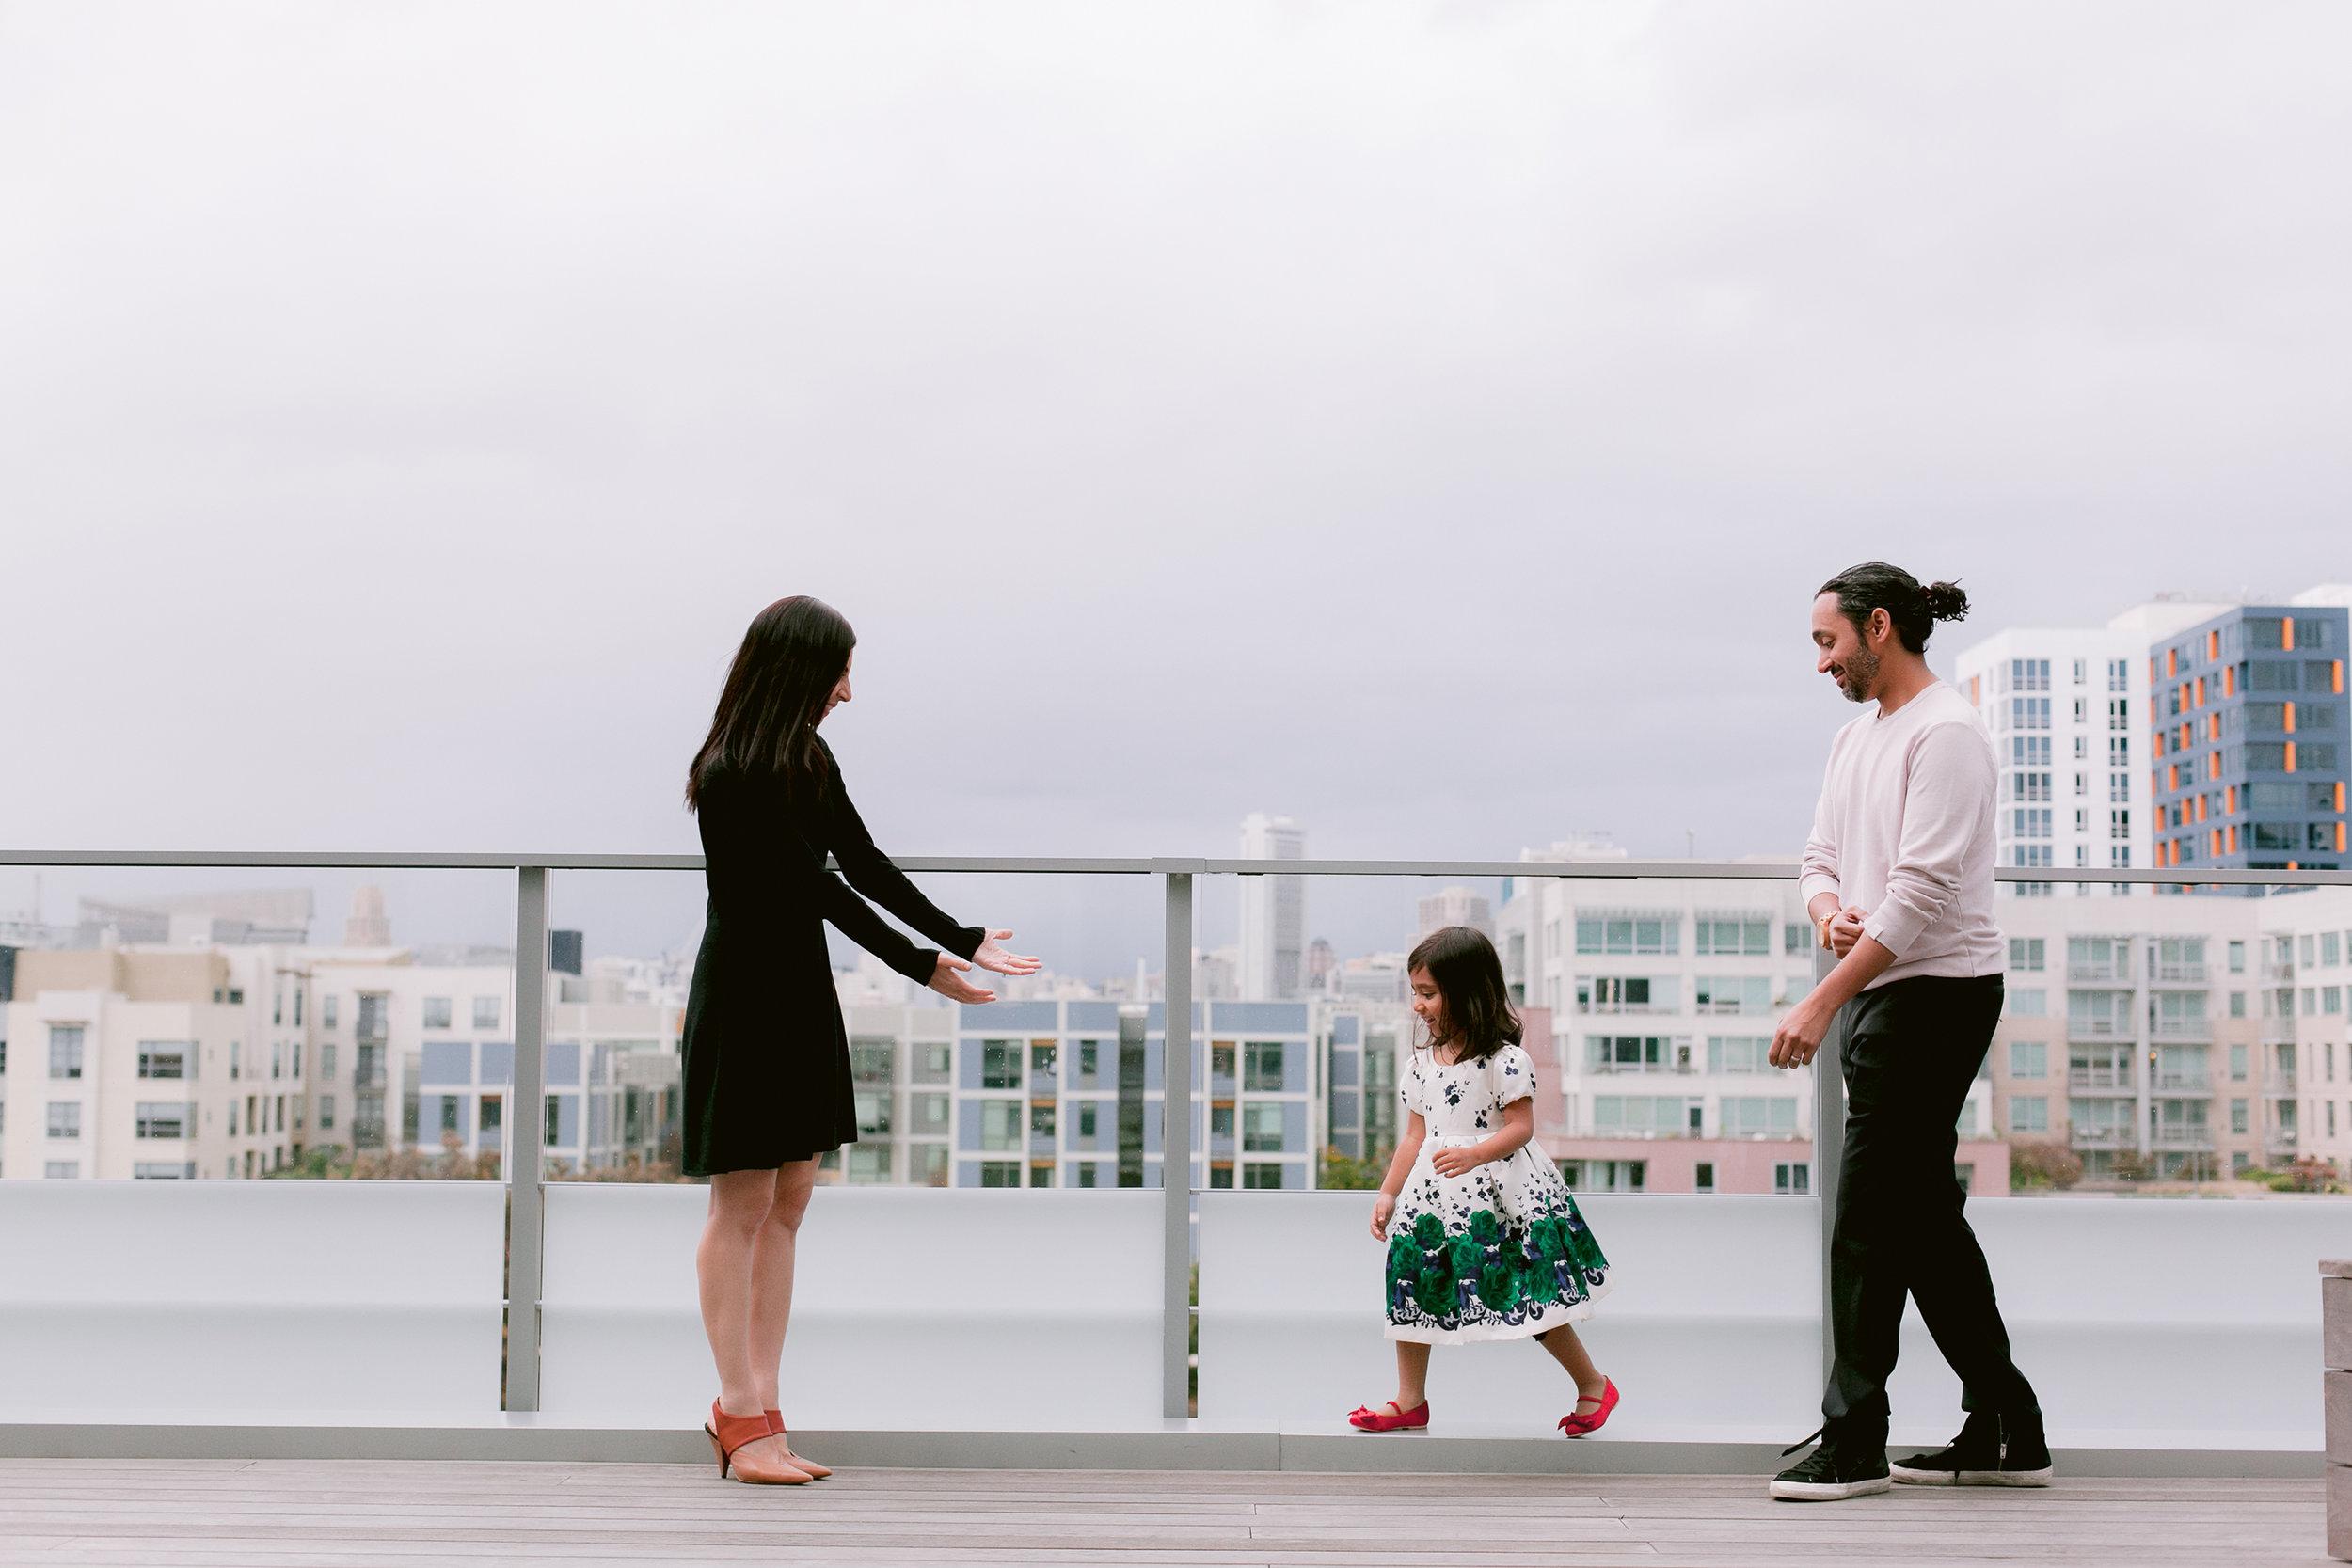 San_Francisco_Children_and_Family_Portrait_013.jpg